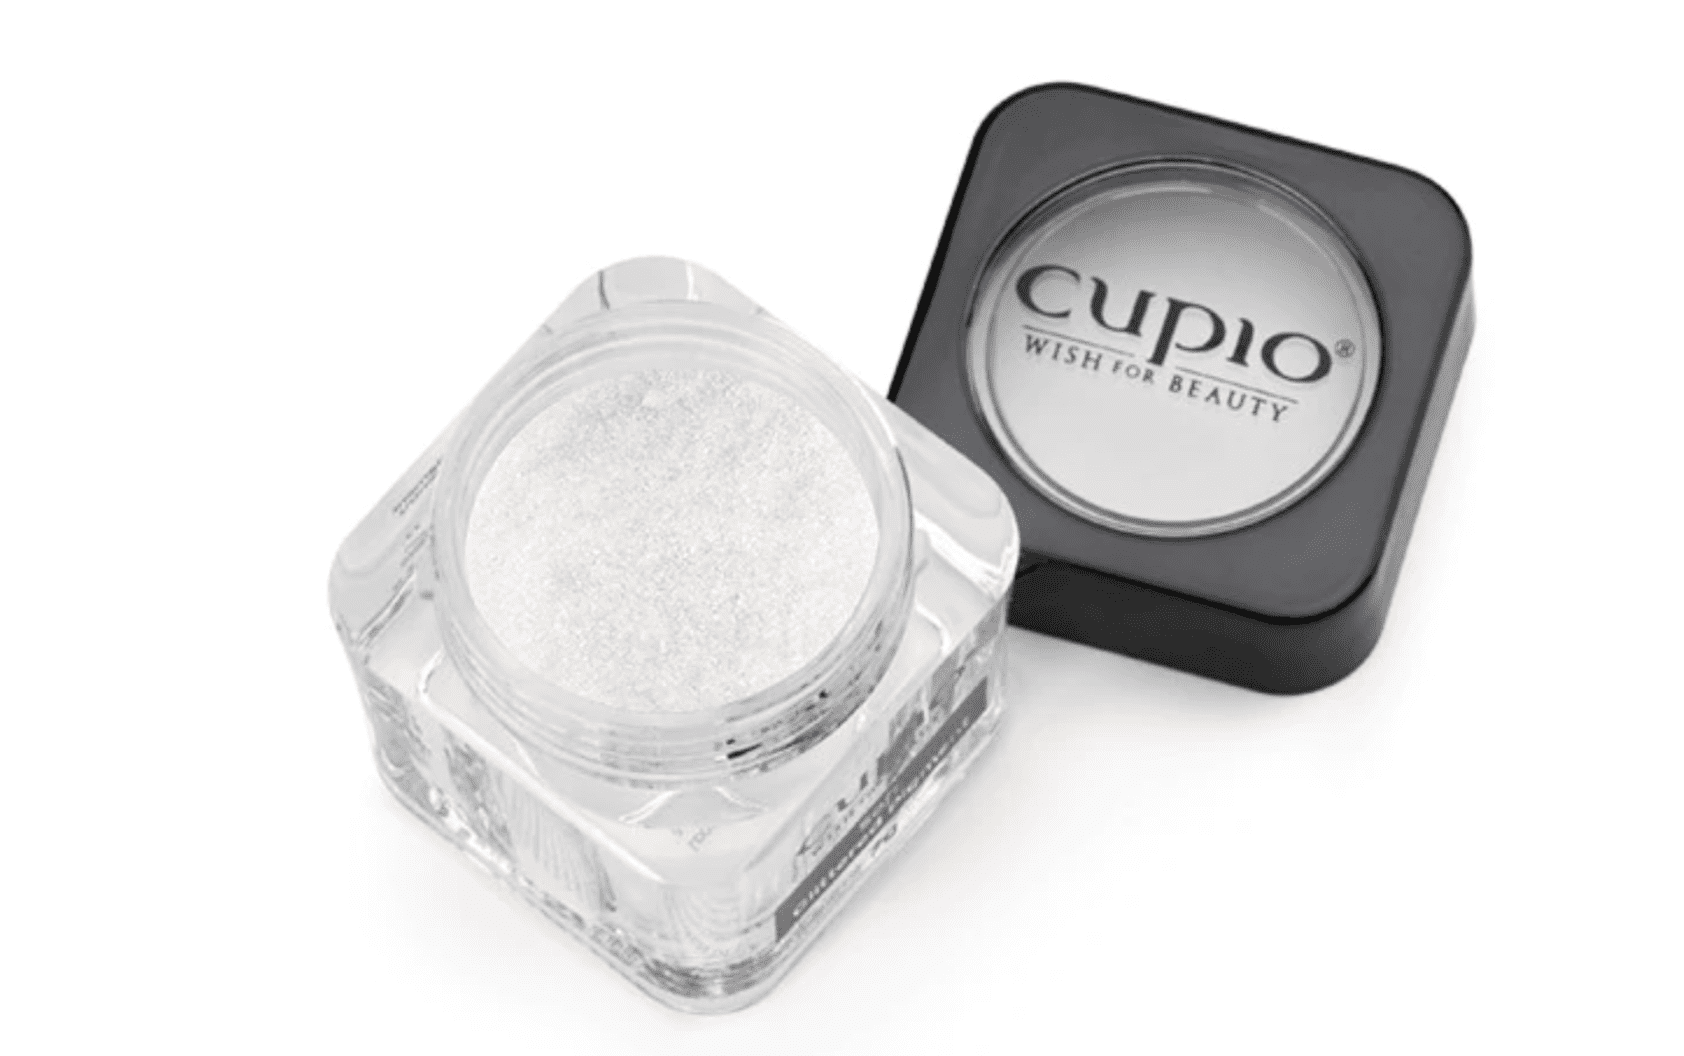 Cupio Glitter Pigment - New Year's Eve Makeup